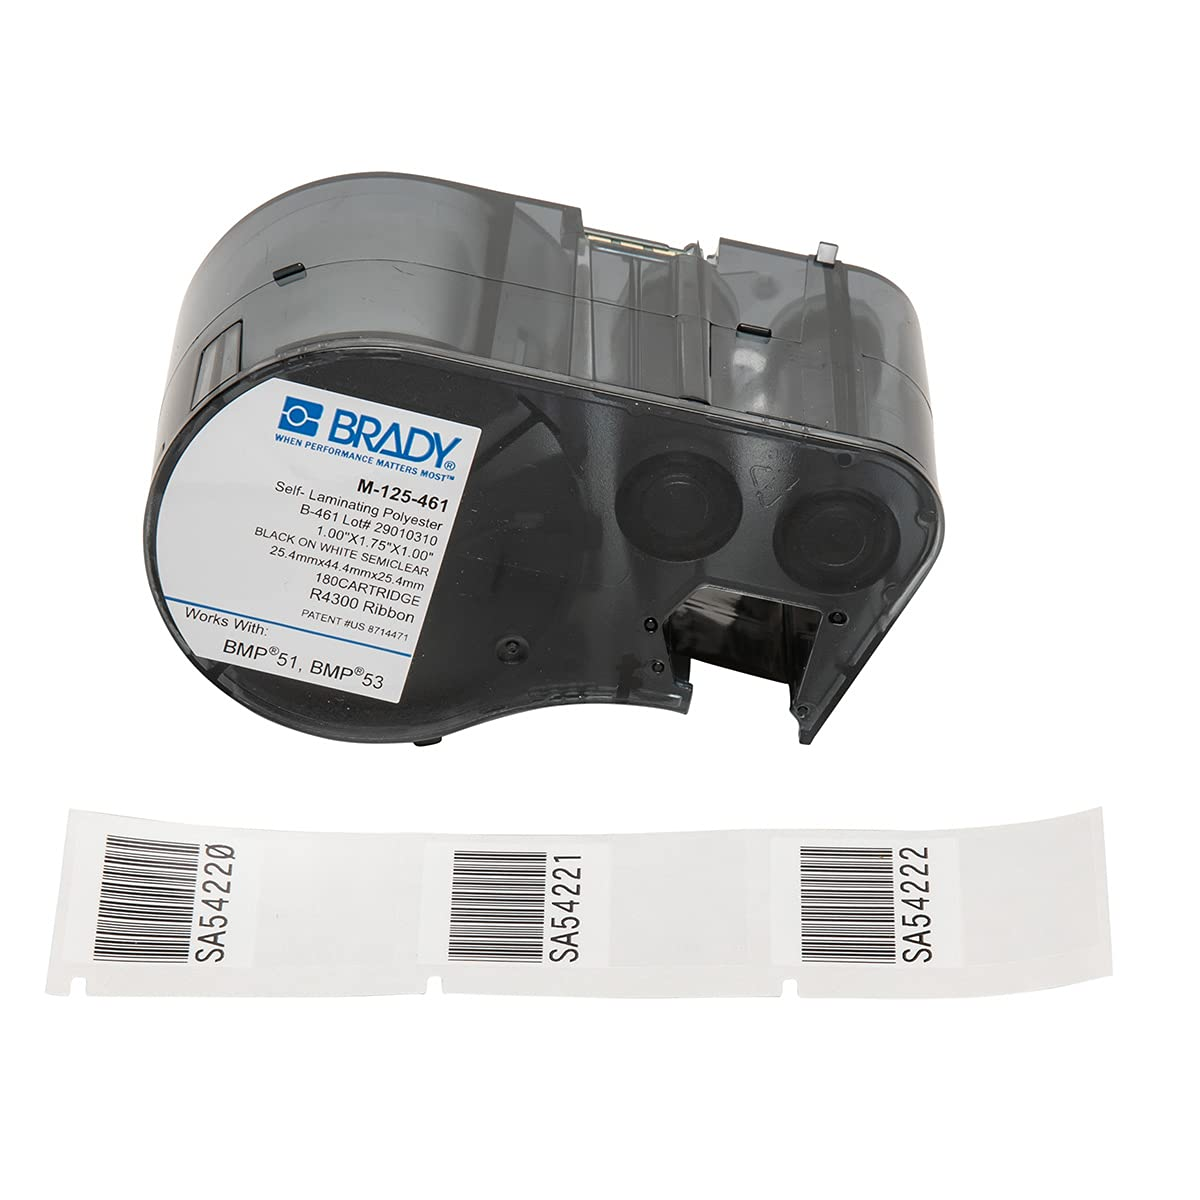 Brady M-125-461 Polyester B-461 Black on White/Clear Label Maker